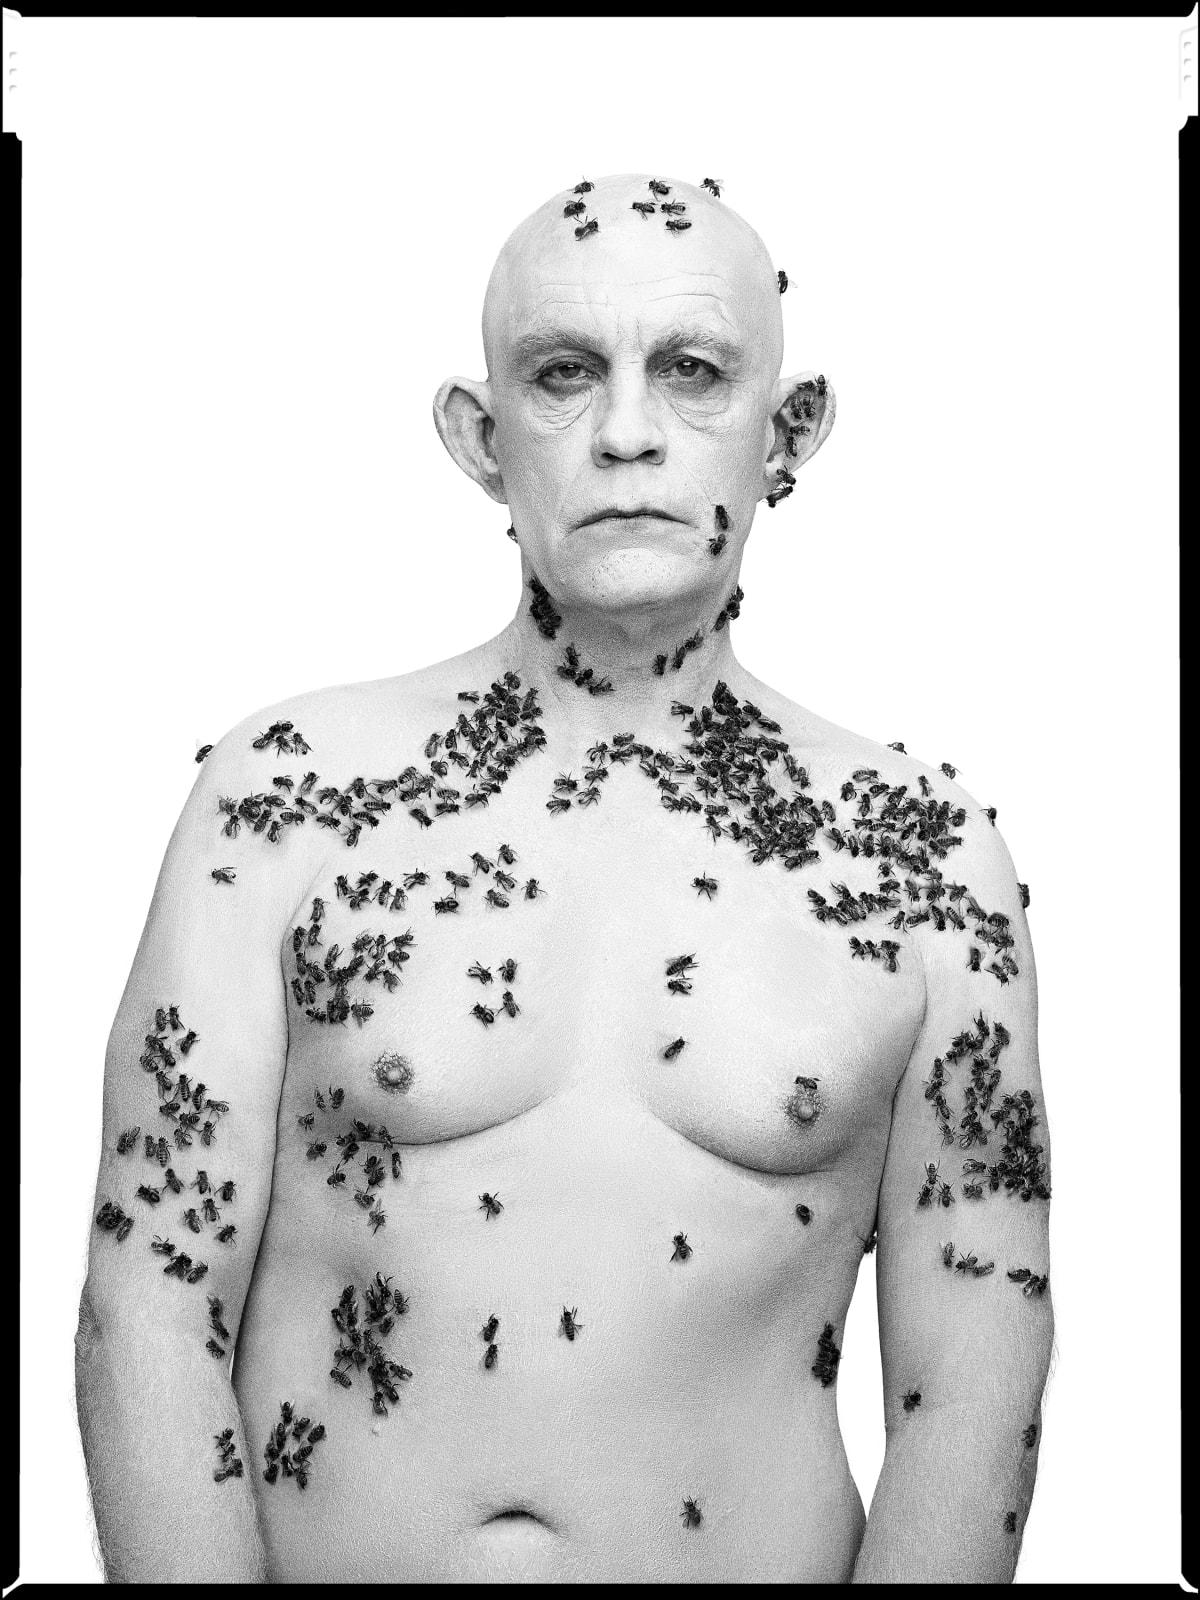 Sandro Miller, Richard Avedon / Ronald Fisher, Beekeeper, Davis, California, May 9 (1981), 2014